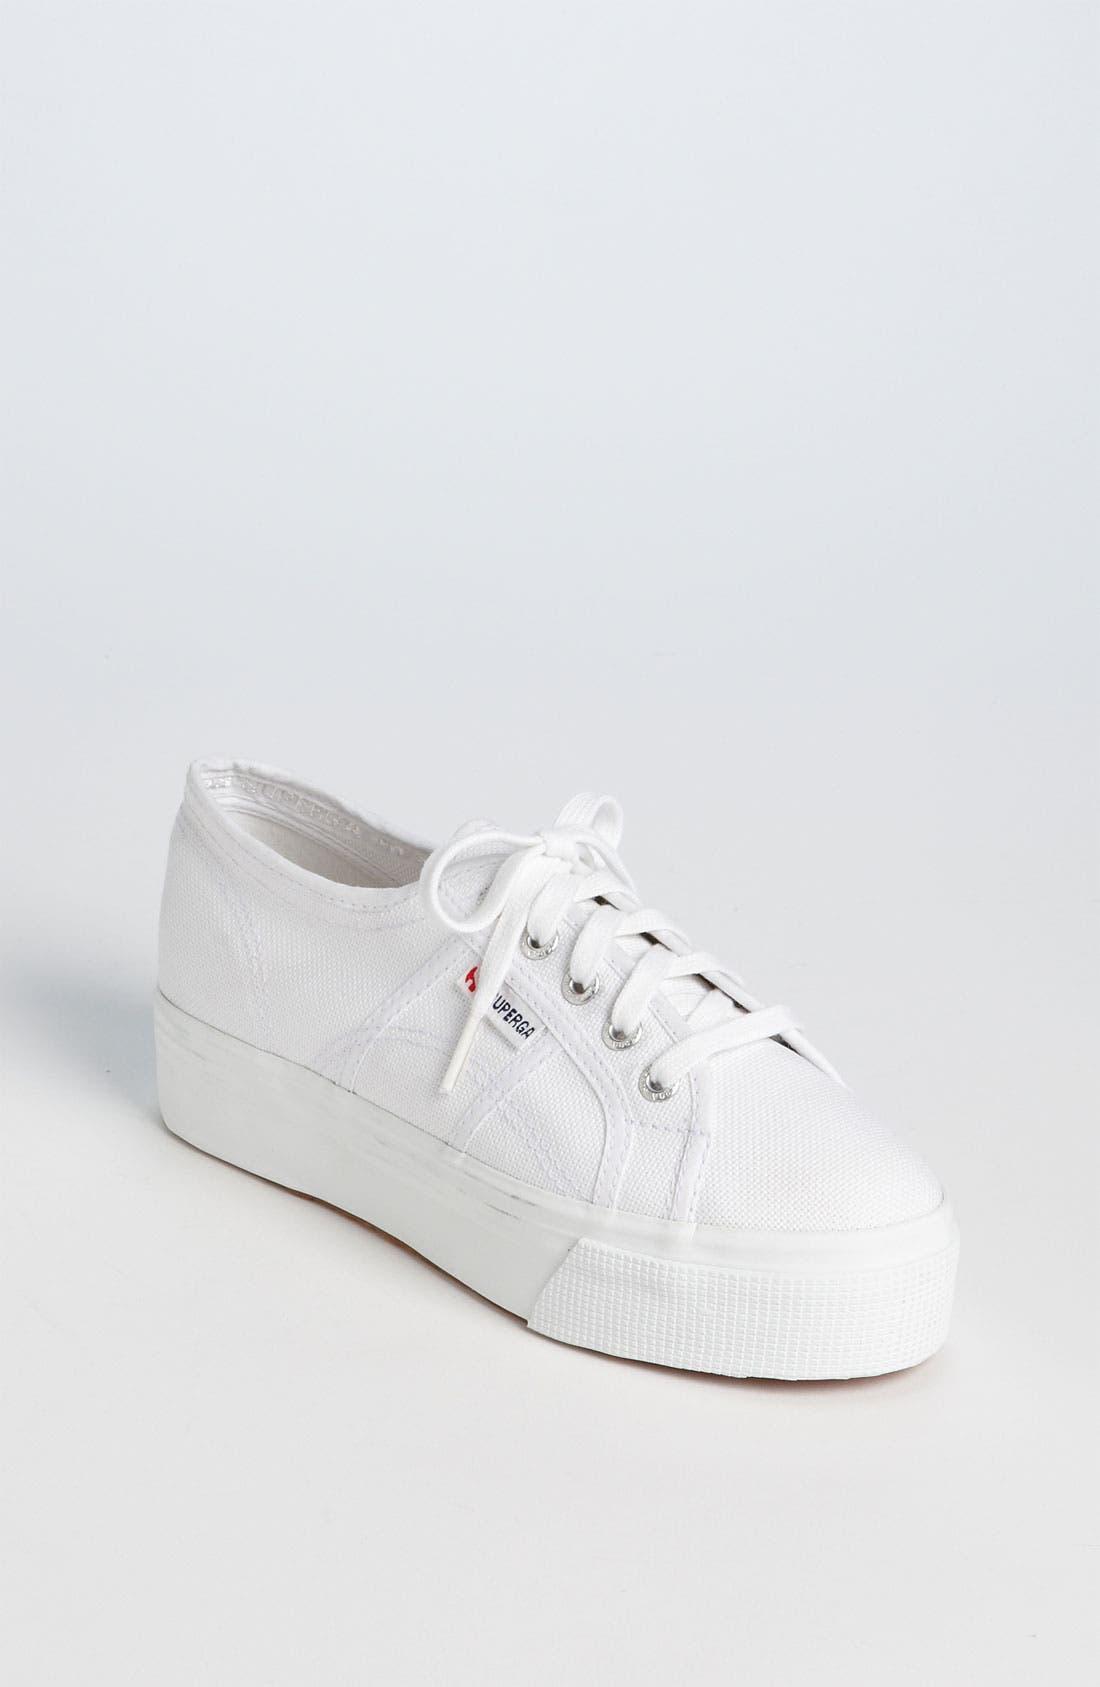 Main Image - Superga 'Acot Linea' Sneaker (Women)